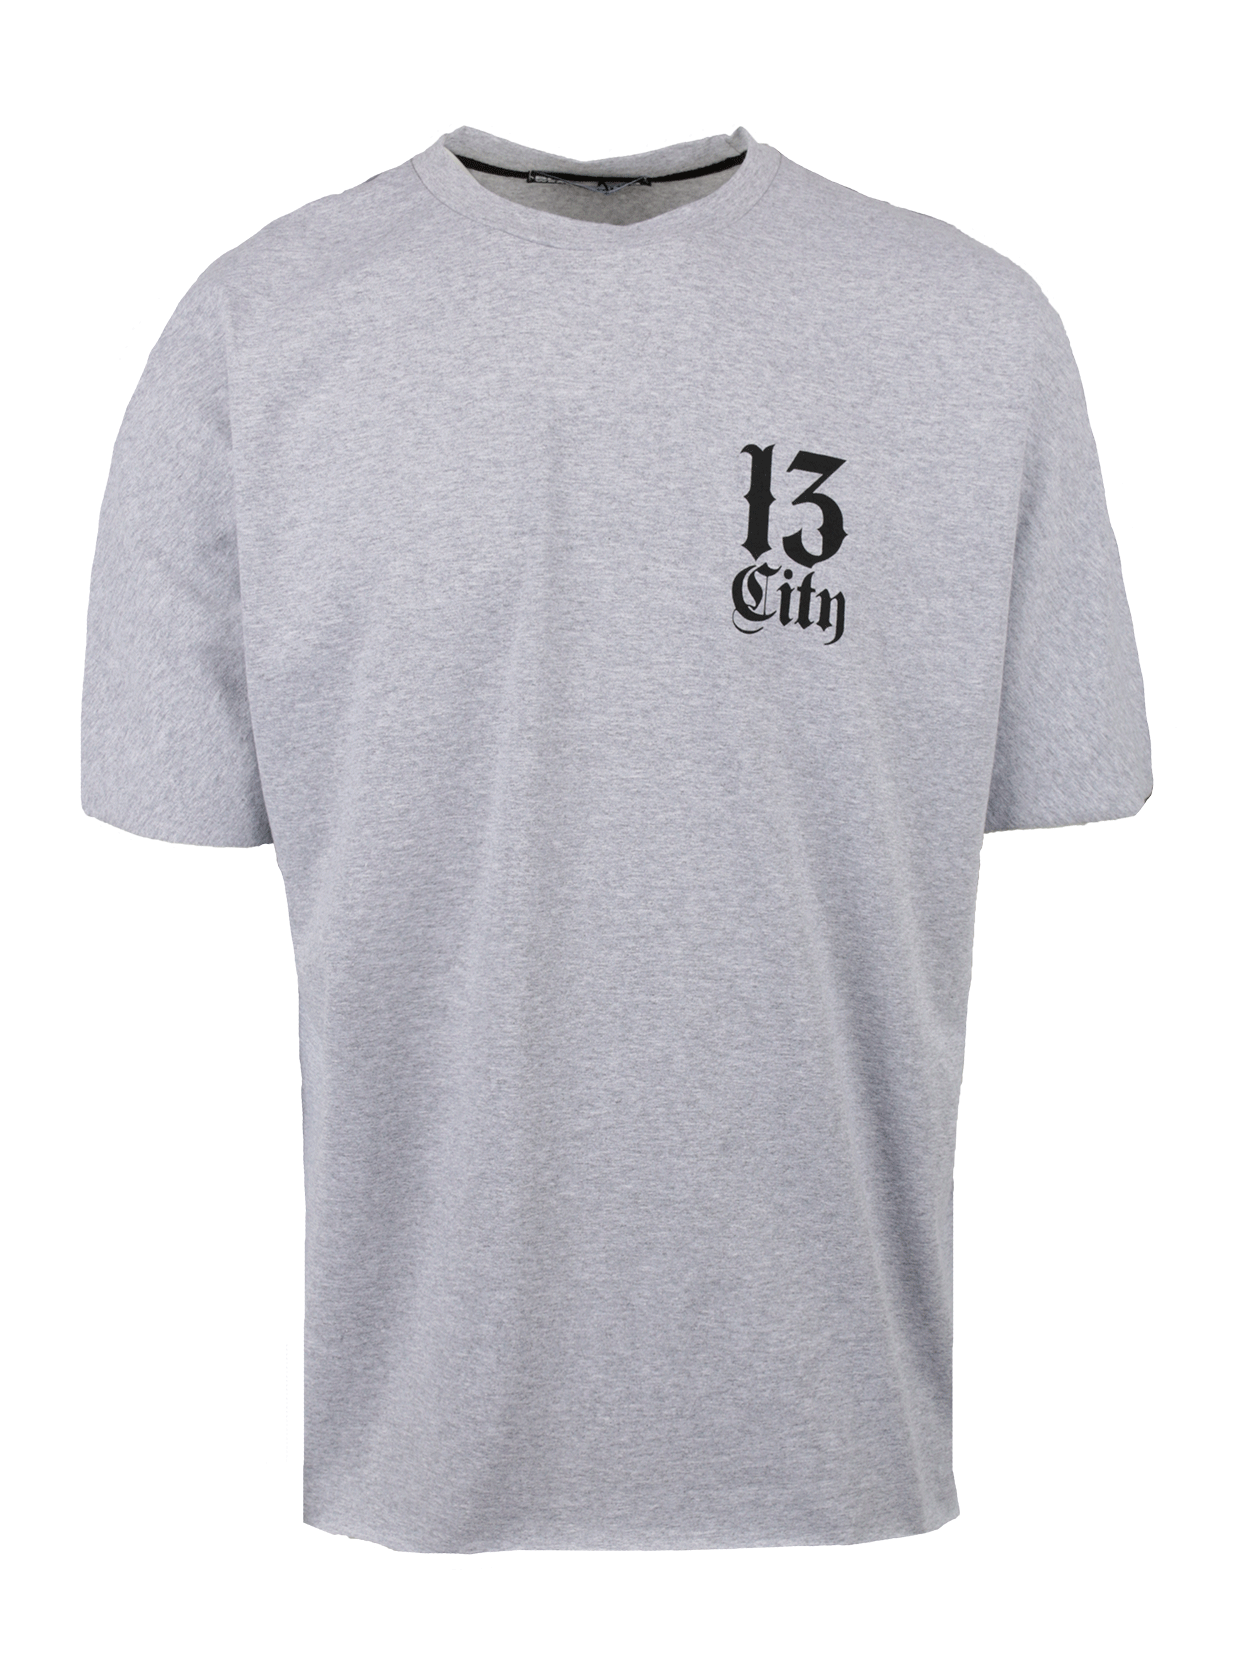 Футболка мужская CITY 13